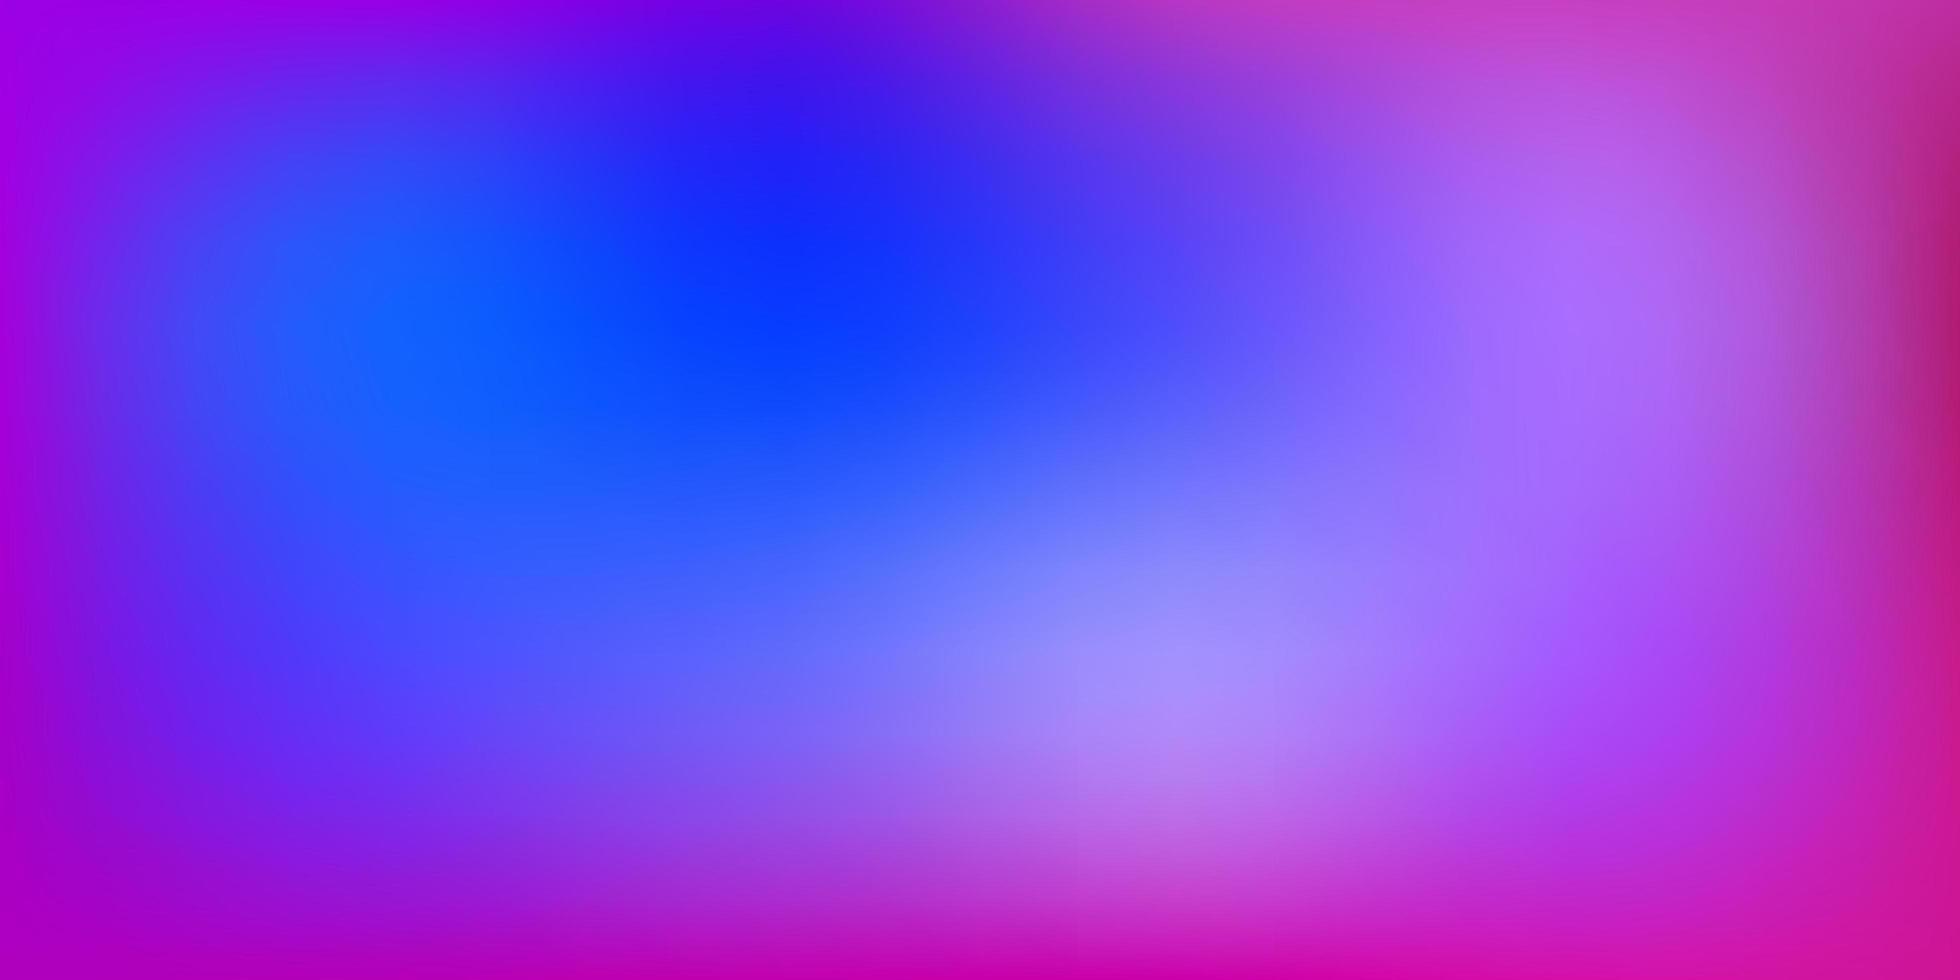 hellblaues, rotes Vektorgradienten-Unschärfemuster. vektor